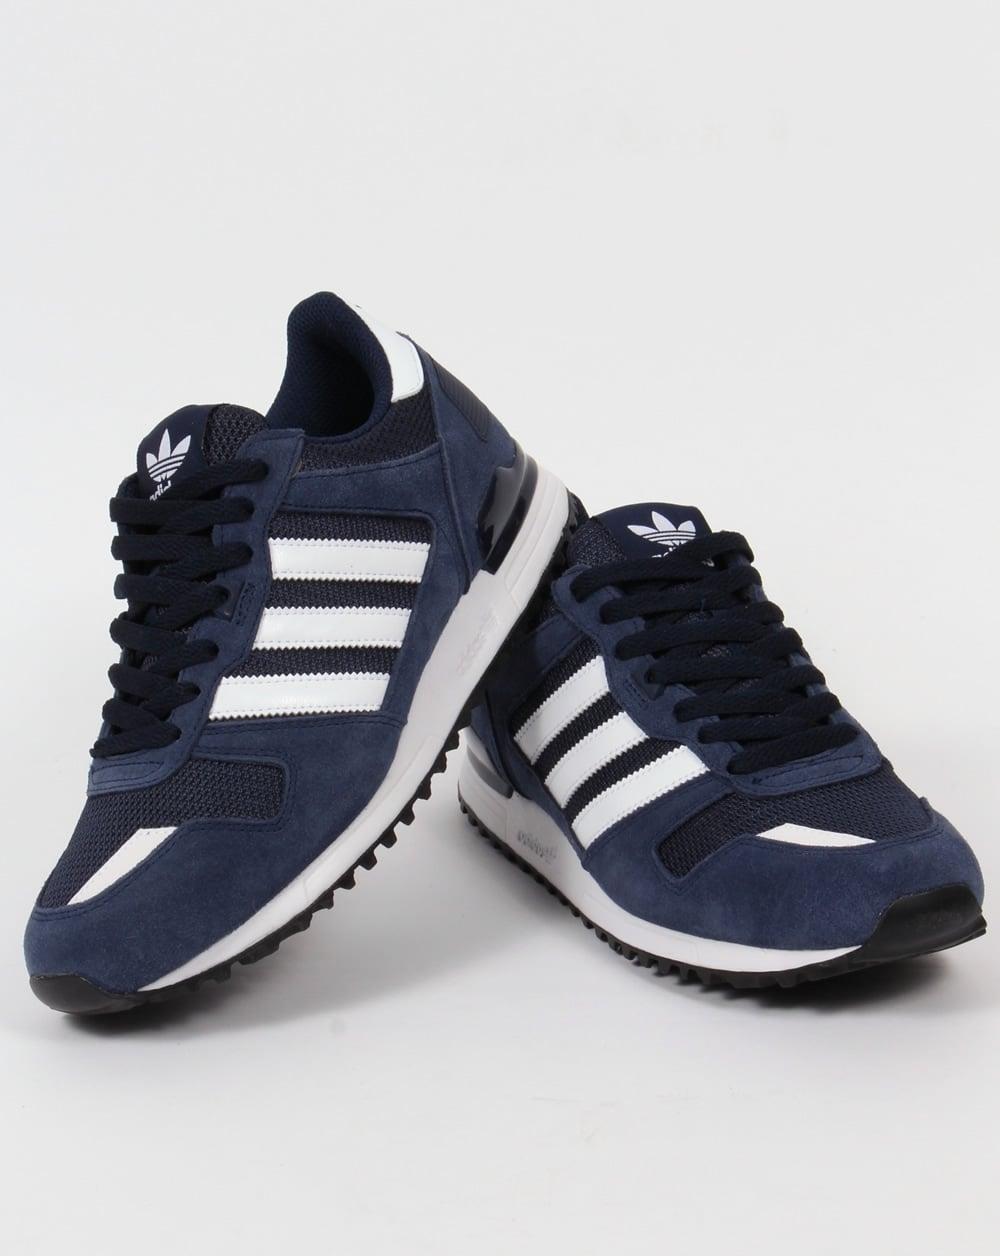 Menns Adidas Marineblå Og Hvit Zx 700 Trenere QHXWv